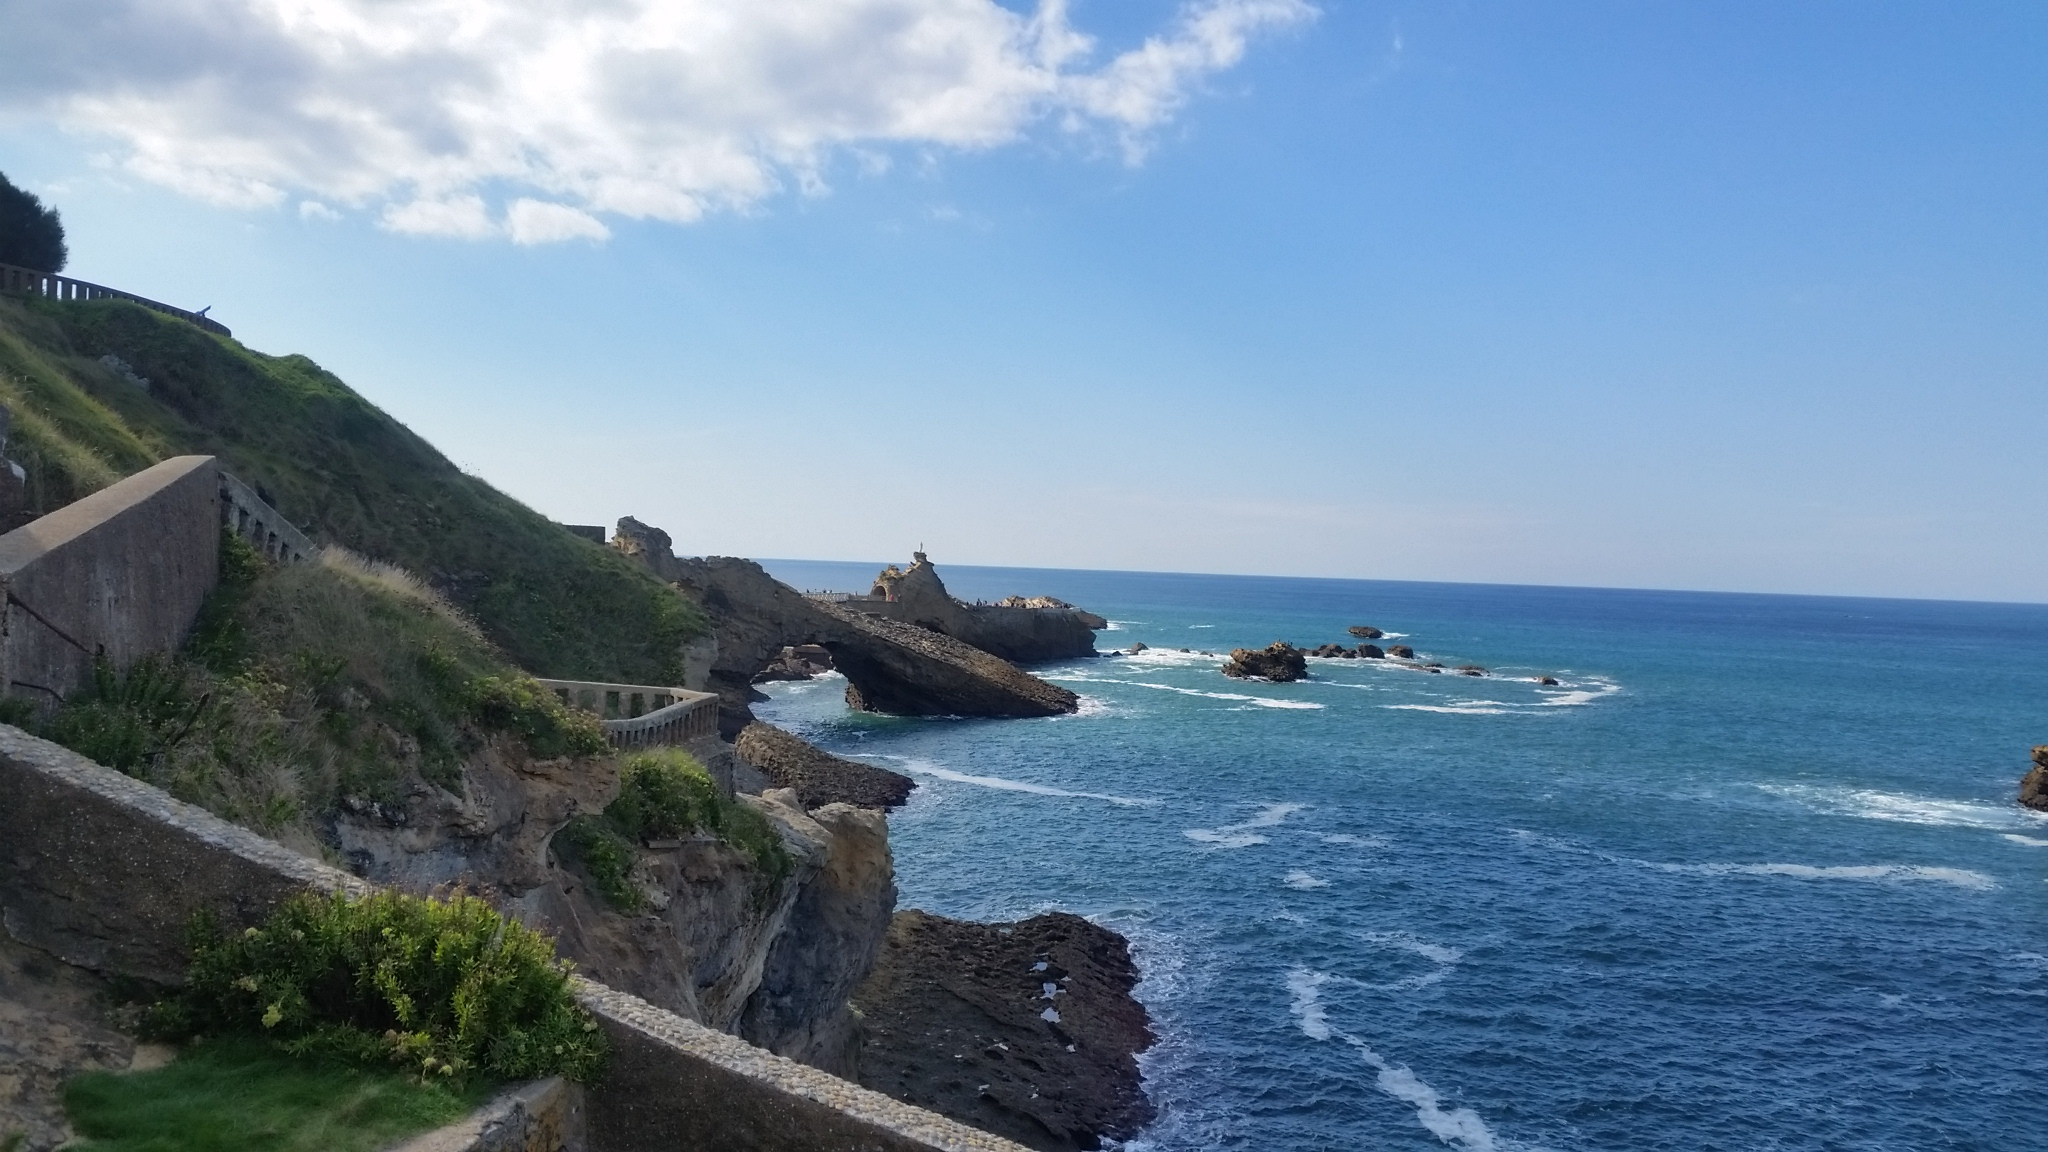 Le littoral, Biarritz